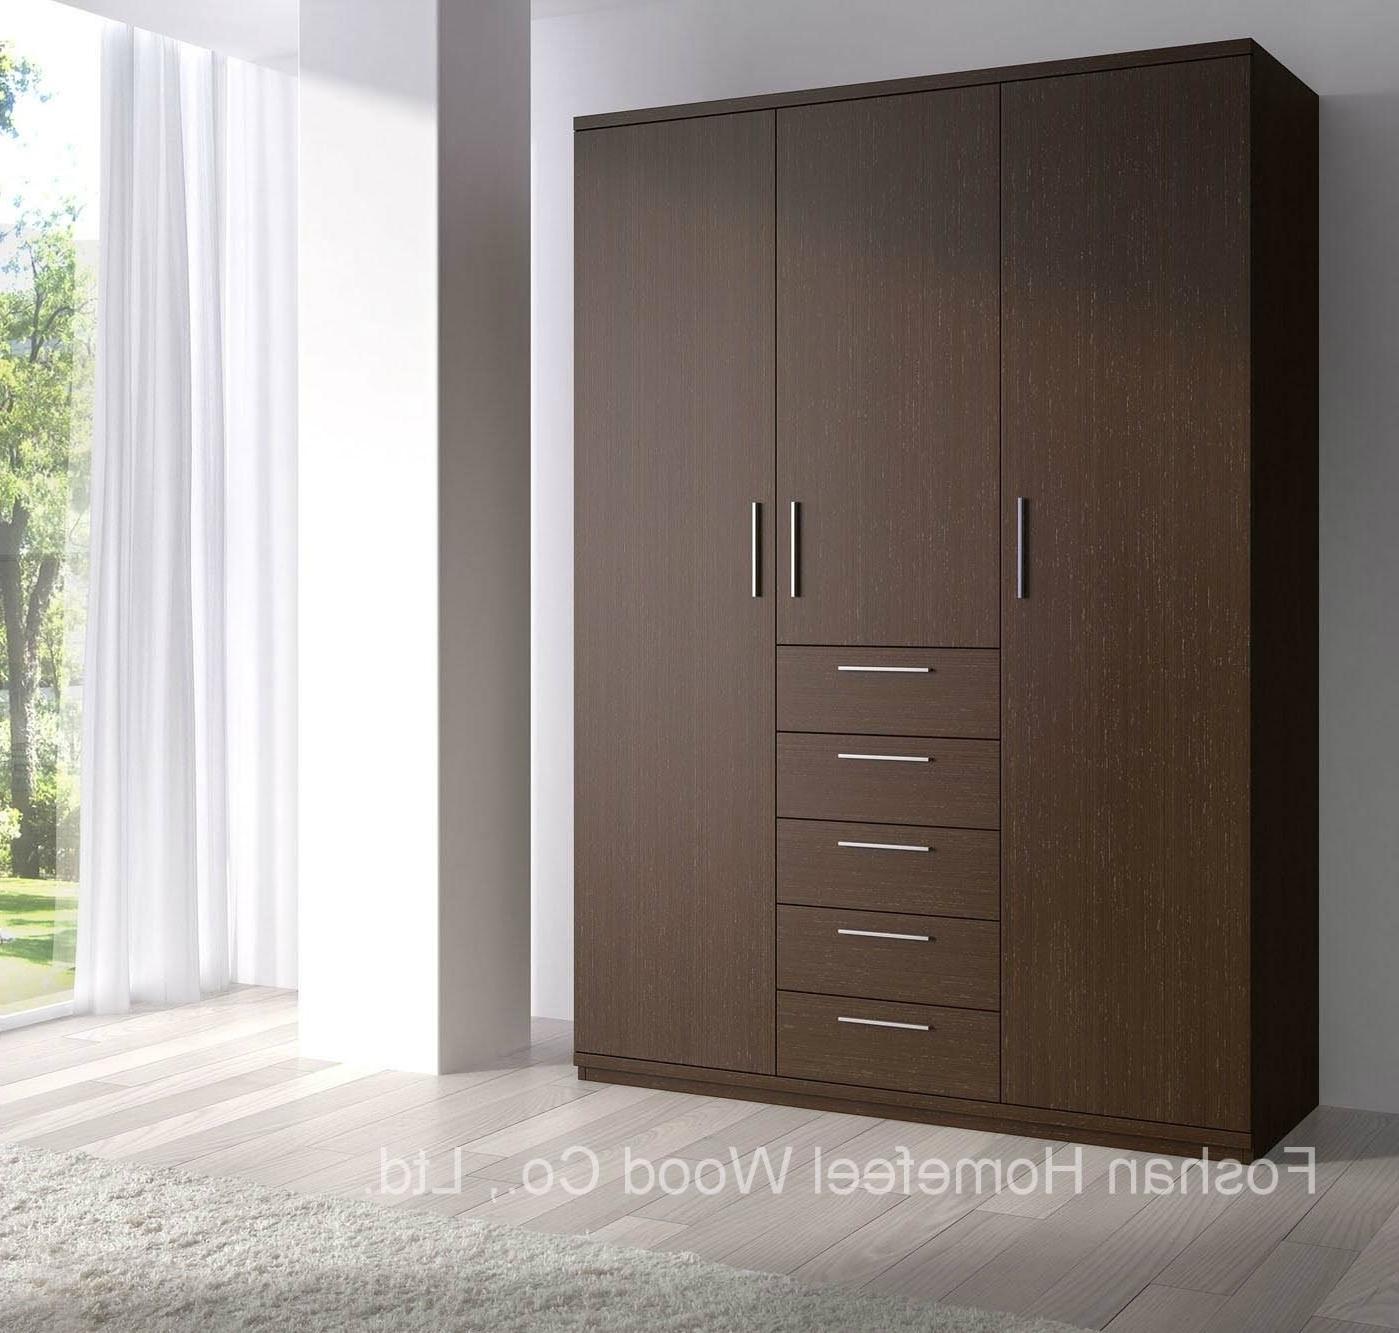 Preferred Dark Wood Wardrobes Beautiful Viewing S Of Solid Dark Wood For Solid Dark Wood Wardrobes (View 9 of 15)